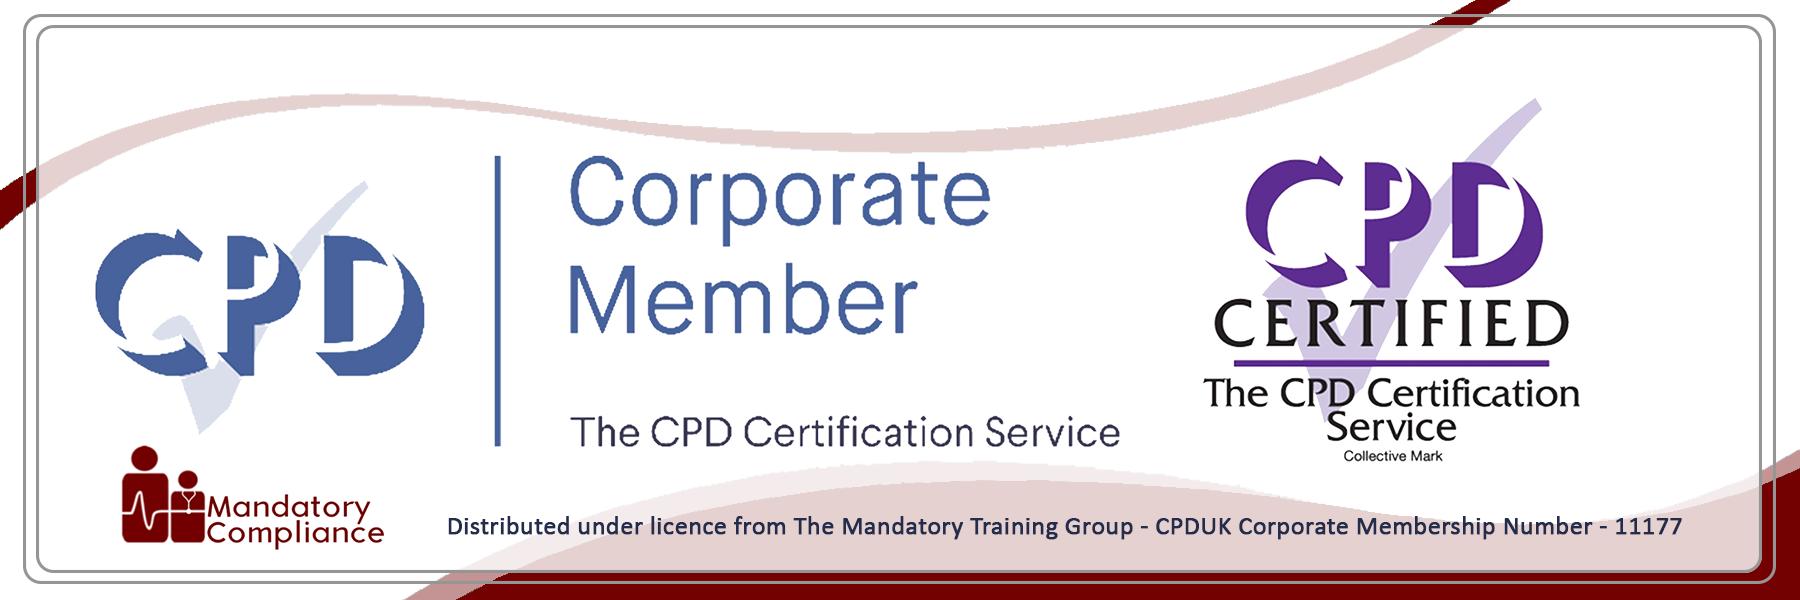 Mastering Microsoft Outlook 2019 - Online Course - Mandatory Compliance UK -